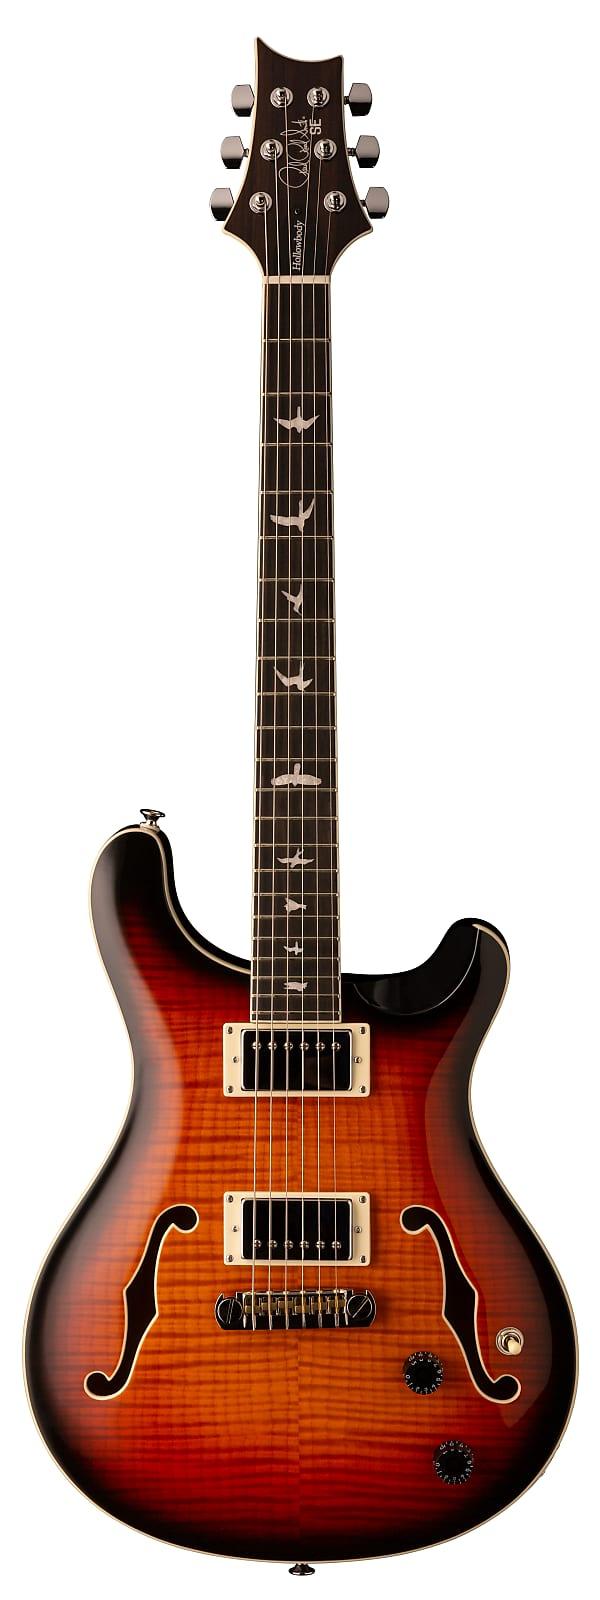 Paul Reed Smith PRS SE Hollowbody II Electric Guitar Tricolor Sunburst w/ Hards